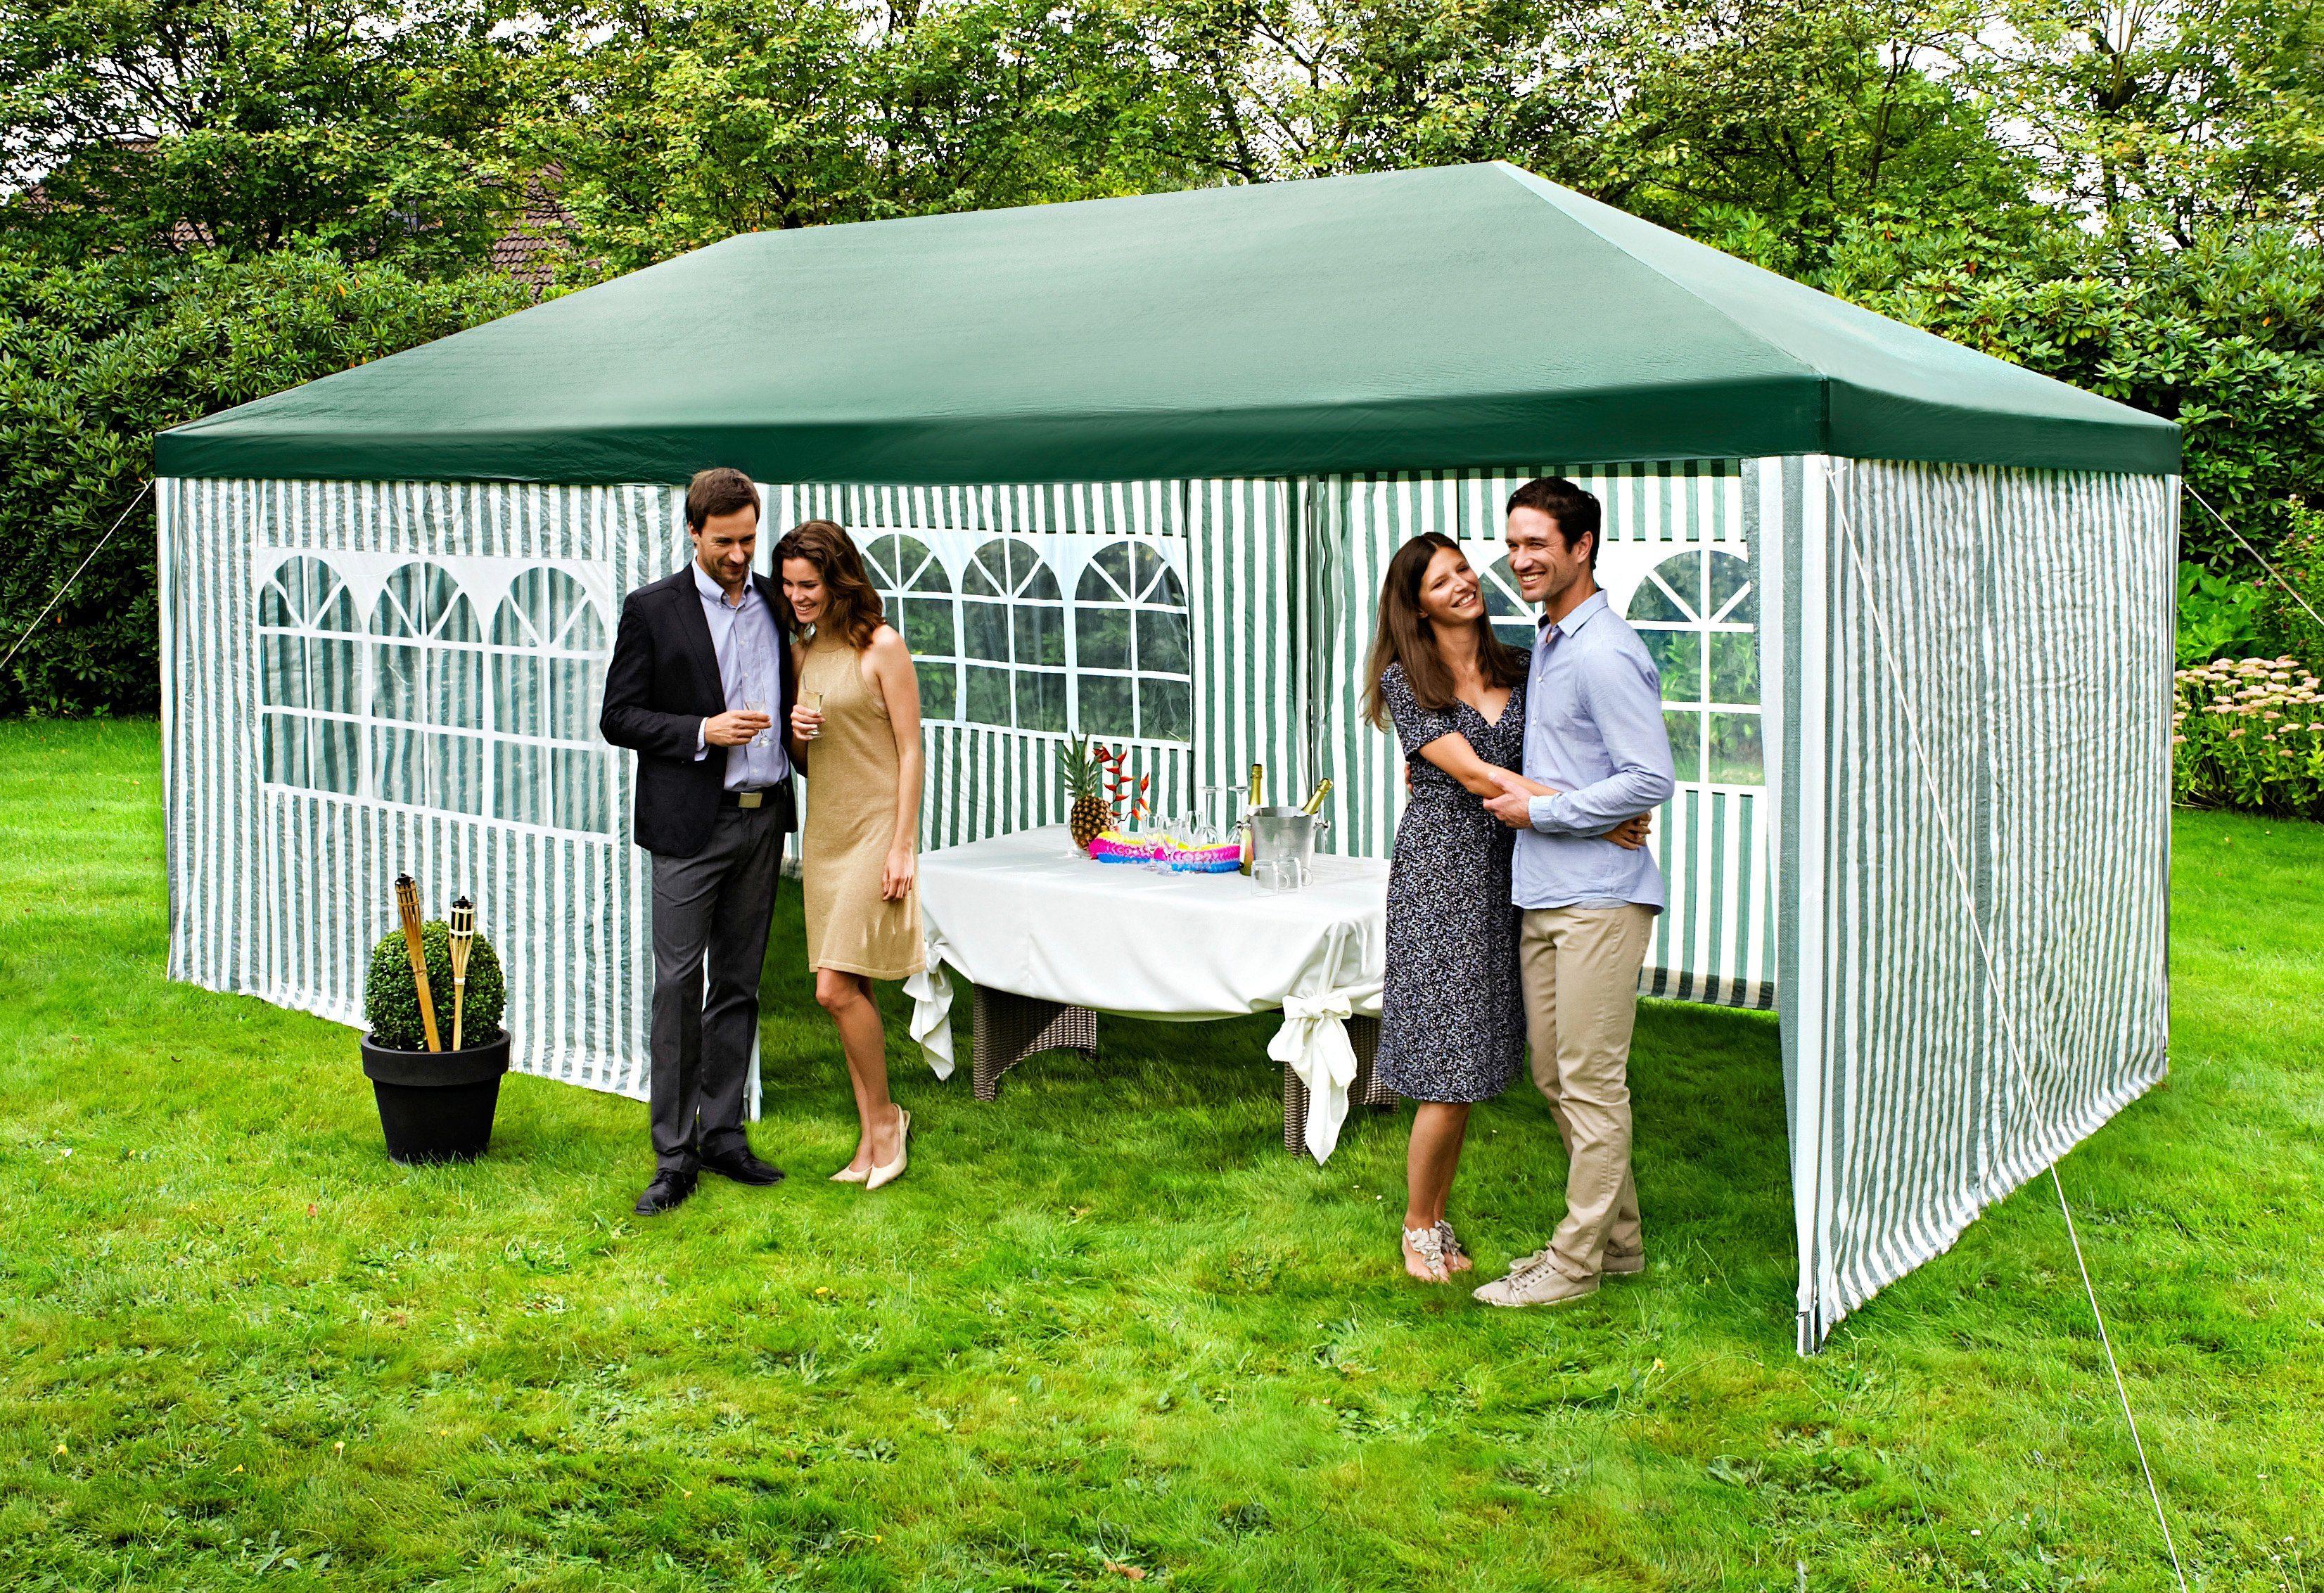 Pavillon »Party«, 300 x 600 cm, grün